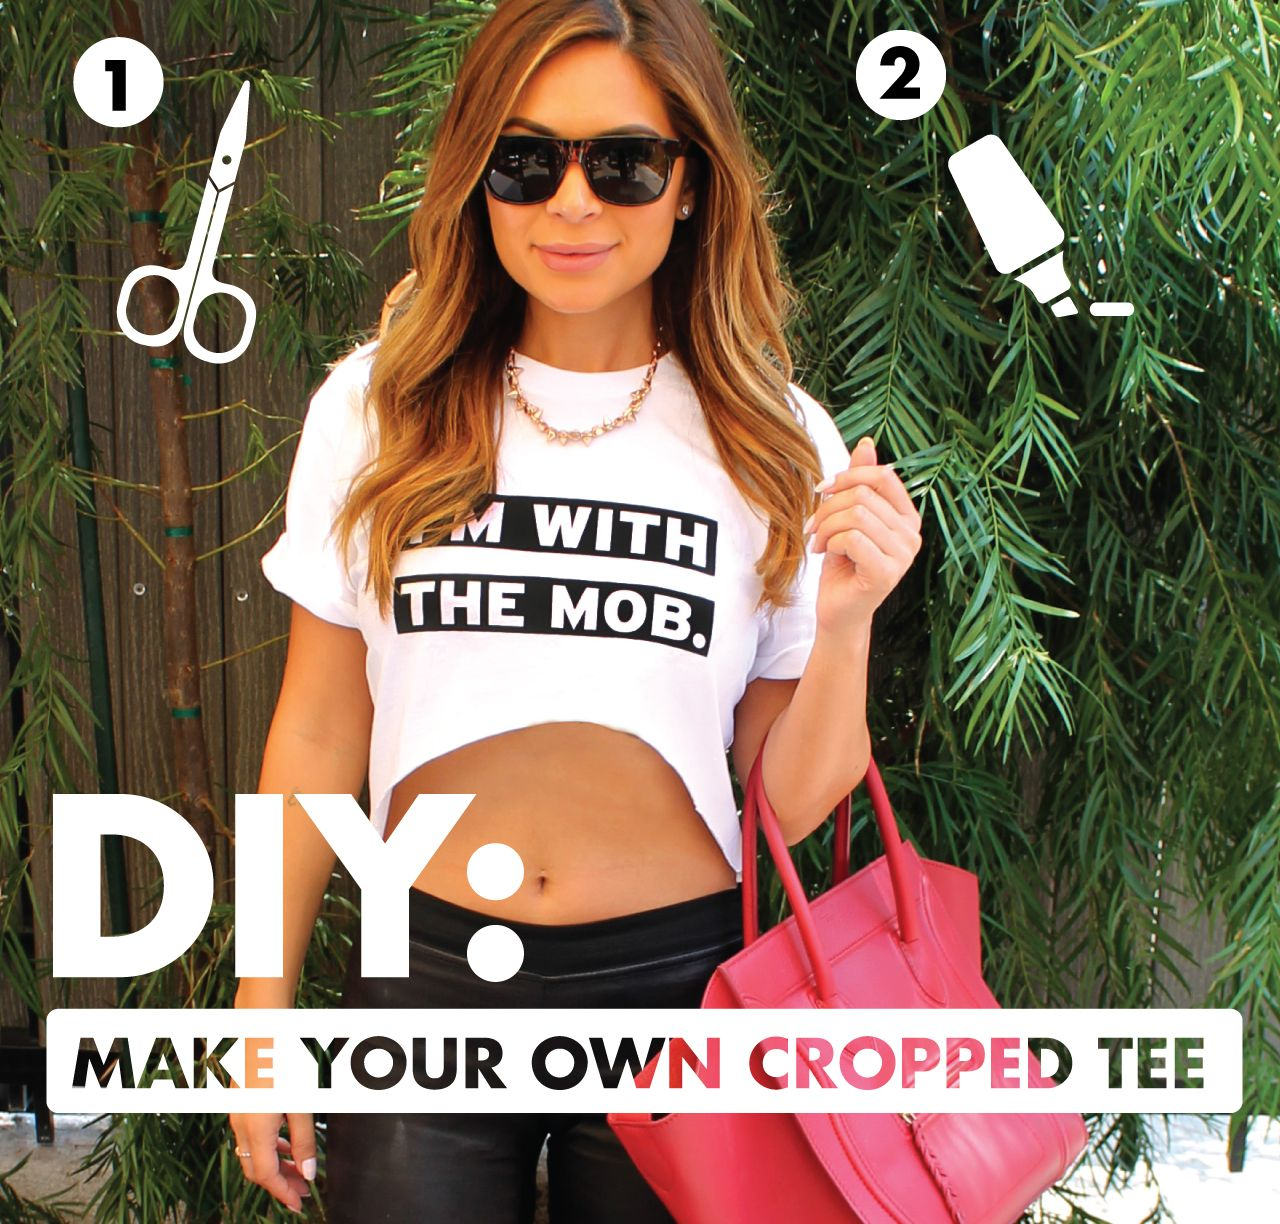 Diy Crop T Shirt Diy Crop Top Diy Fashion Clothing Diy Wardrobe